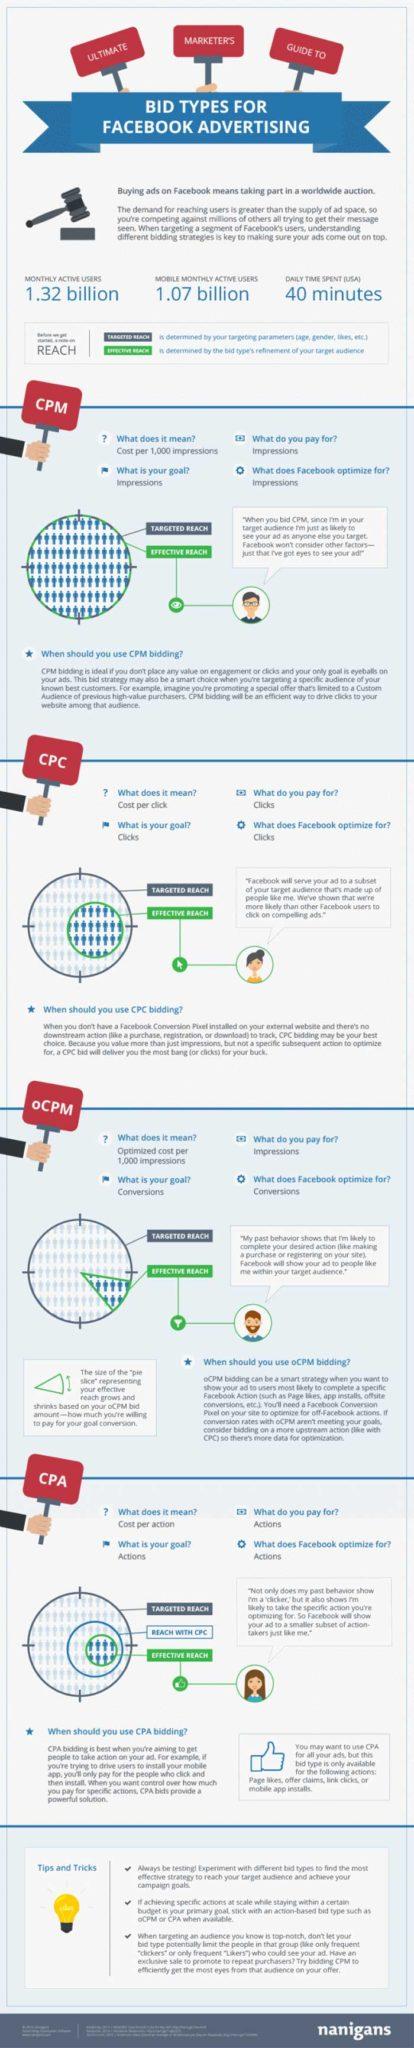 facebook advertising bid types infographic